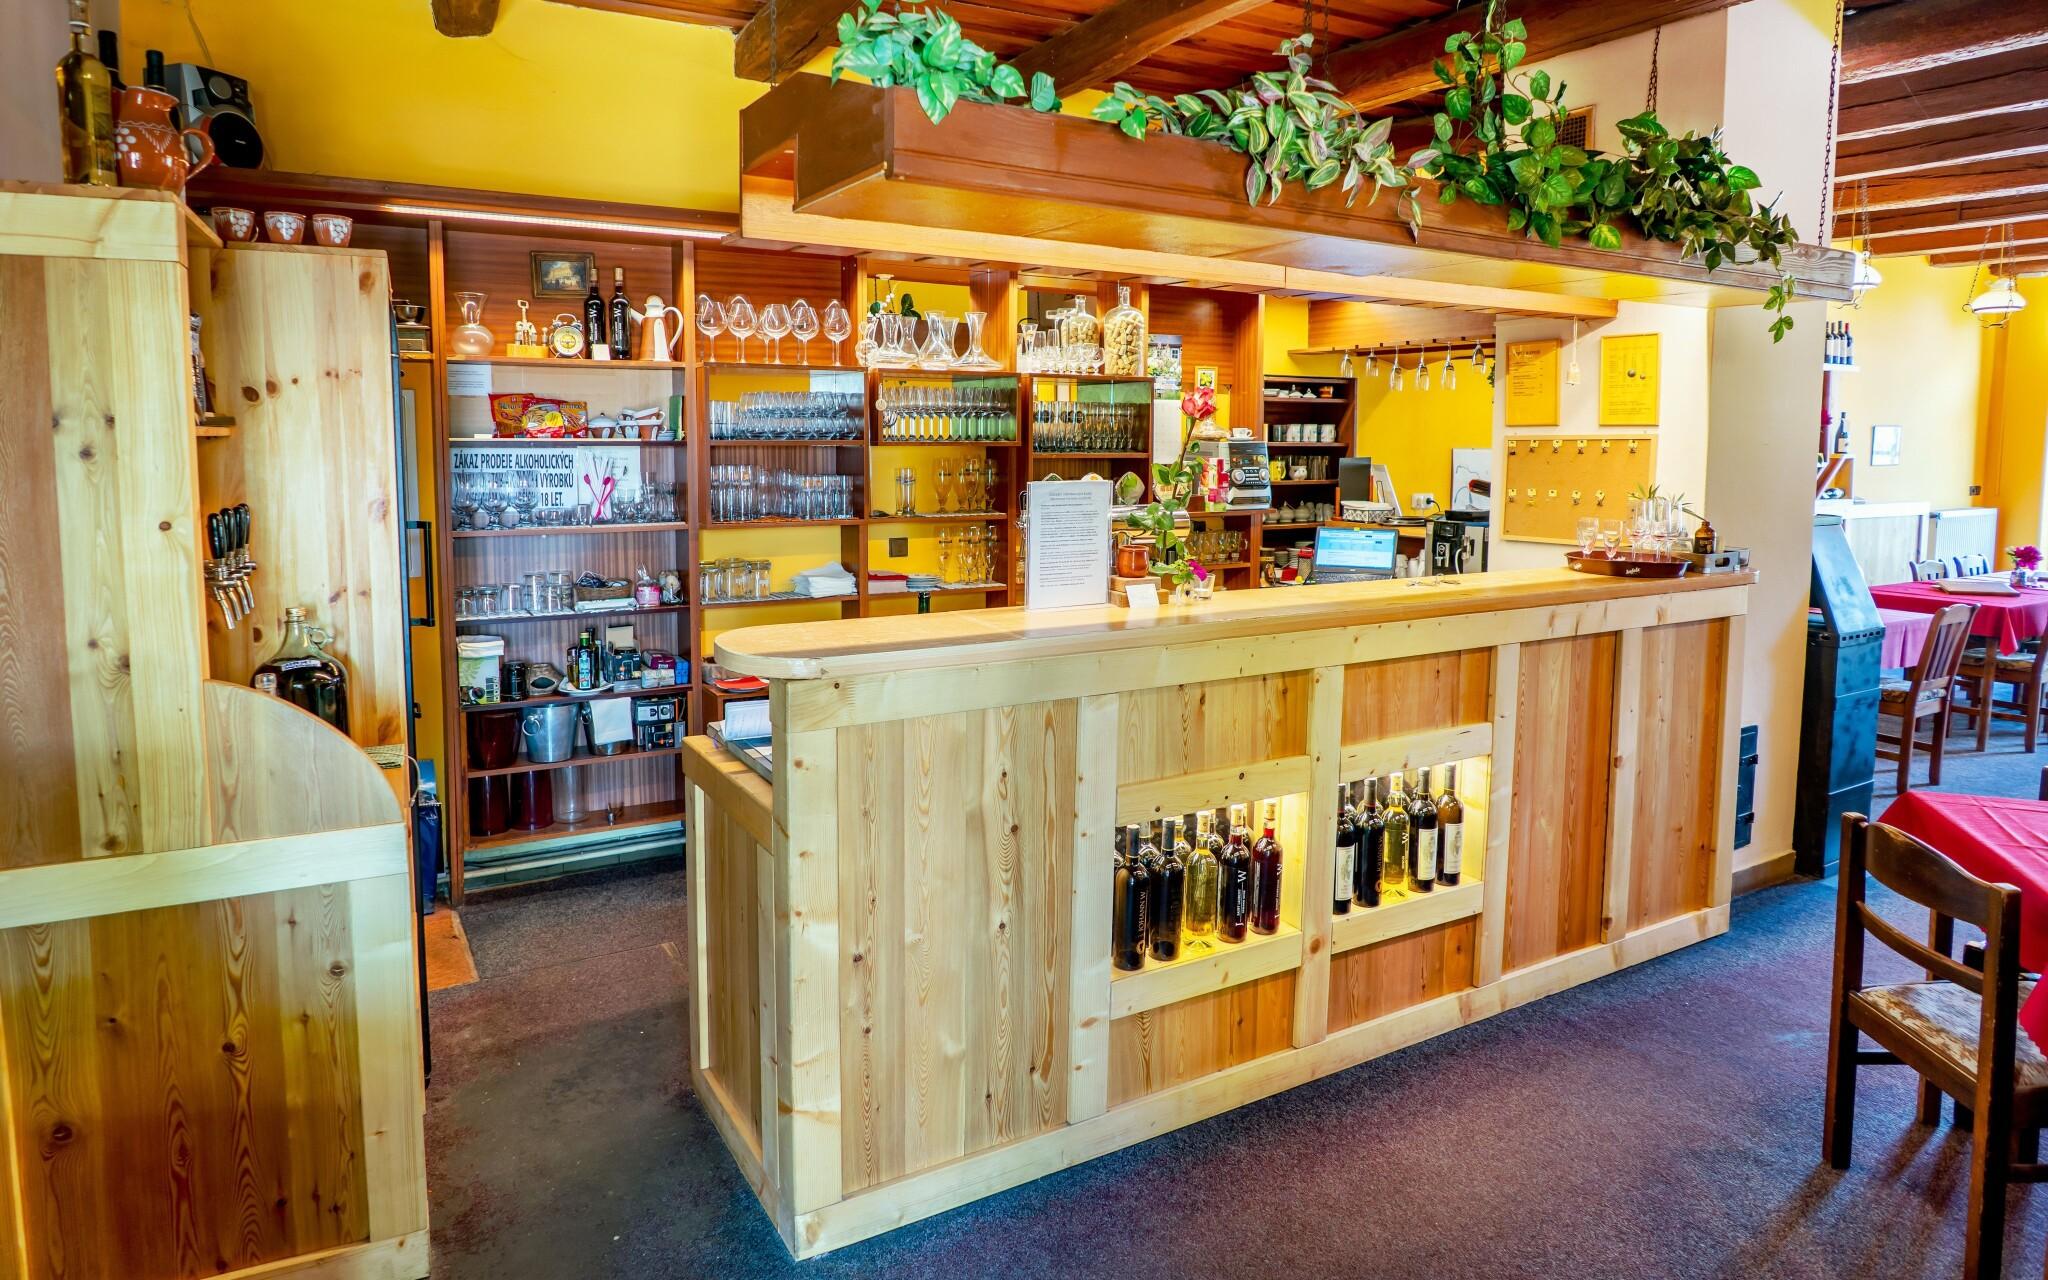 Reštaurácia, bar, Hotel Weiss, Lechovice, južná Morava